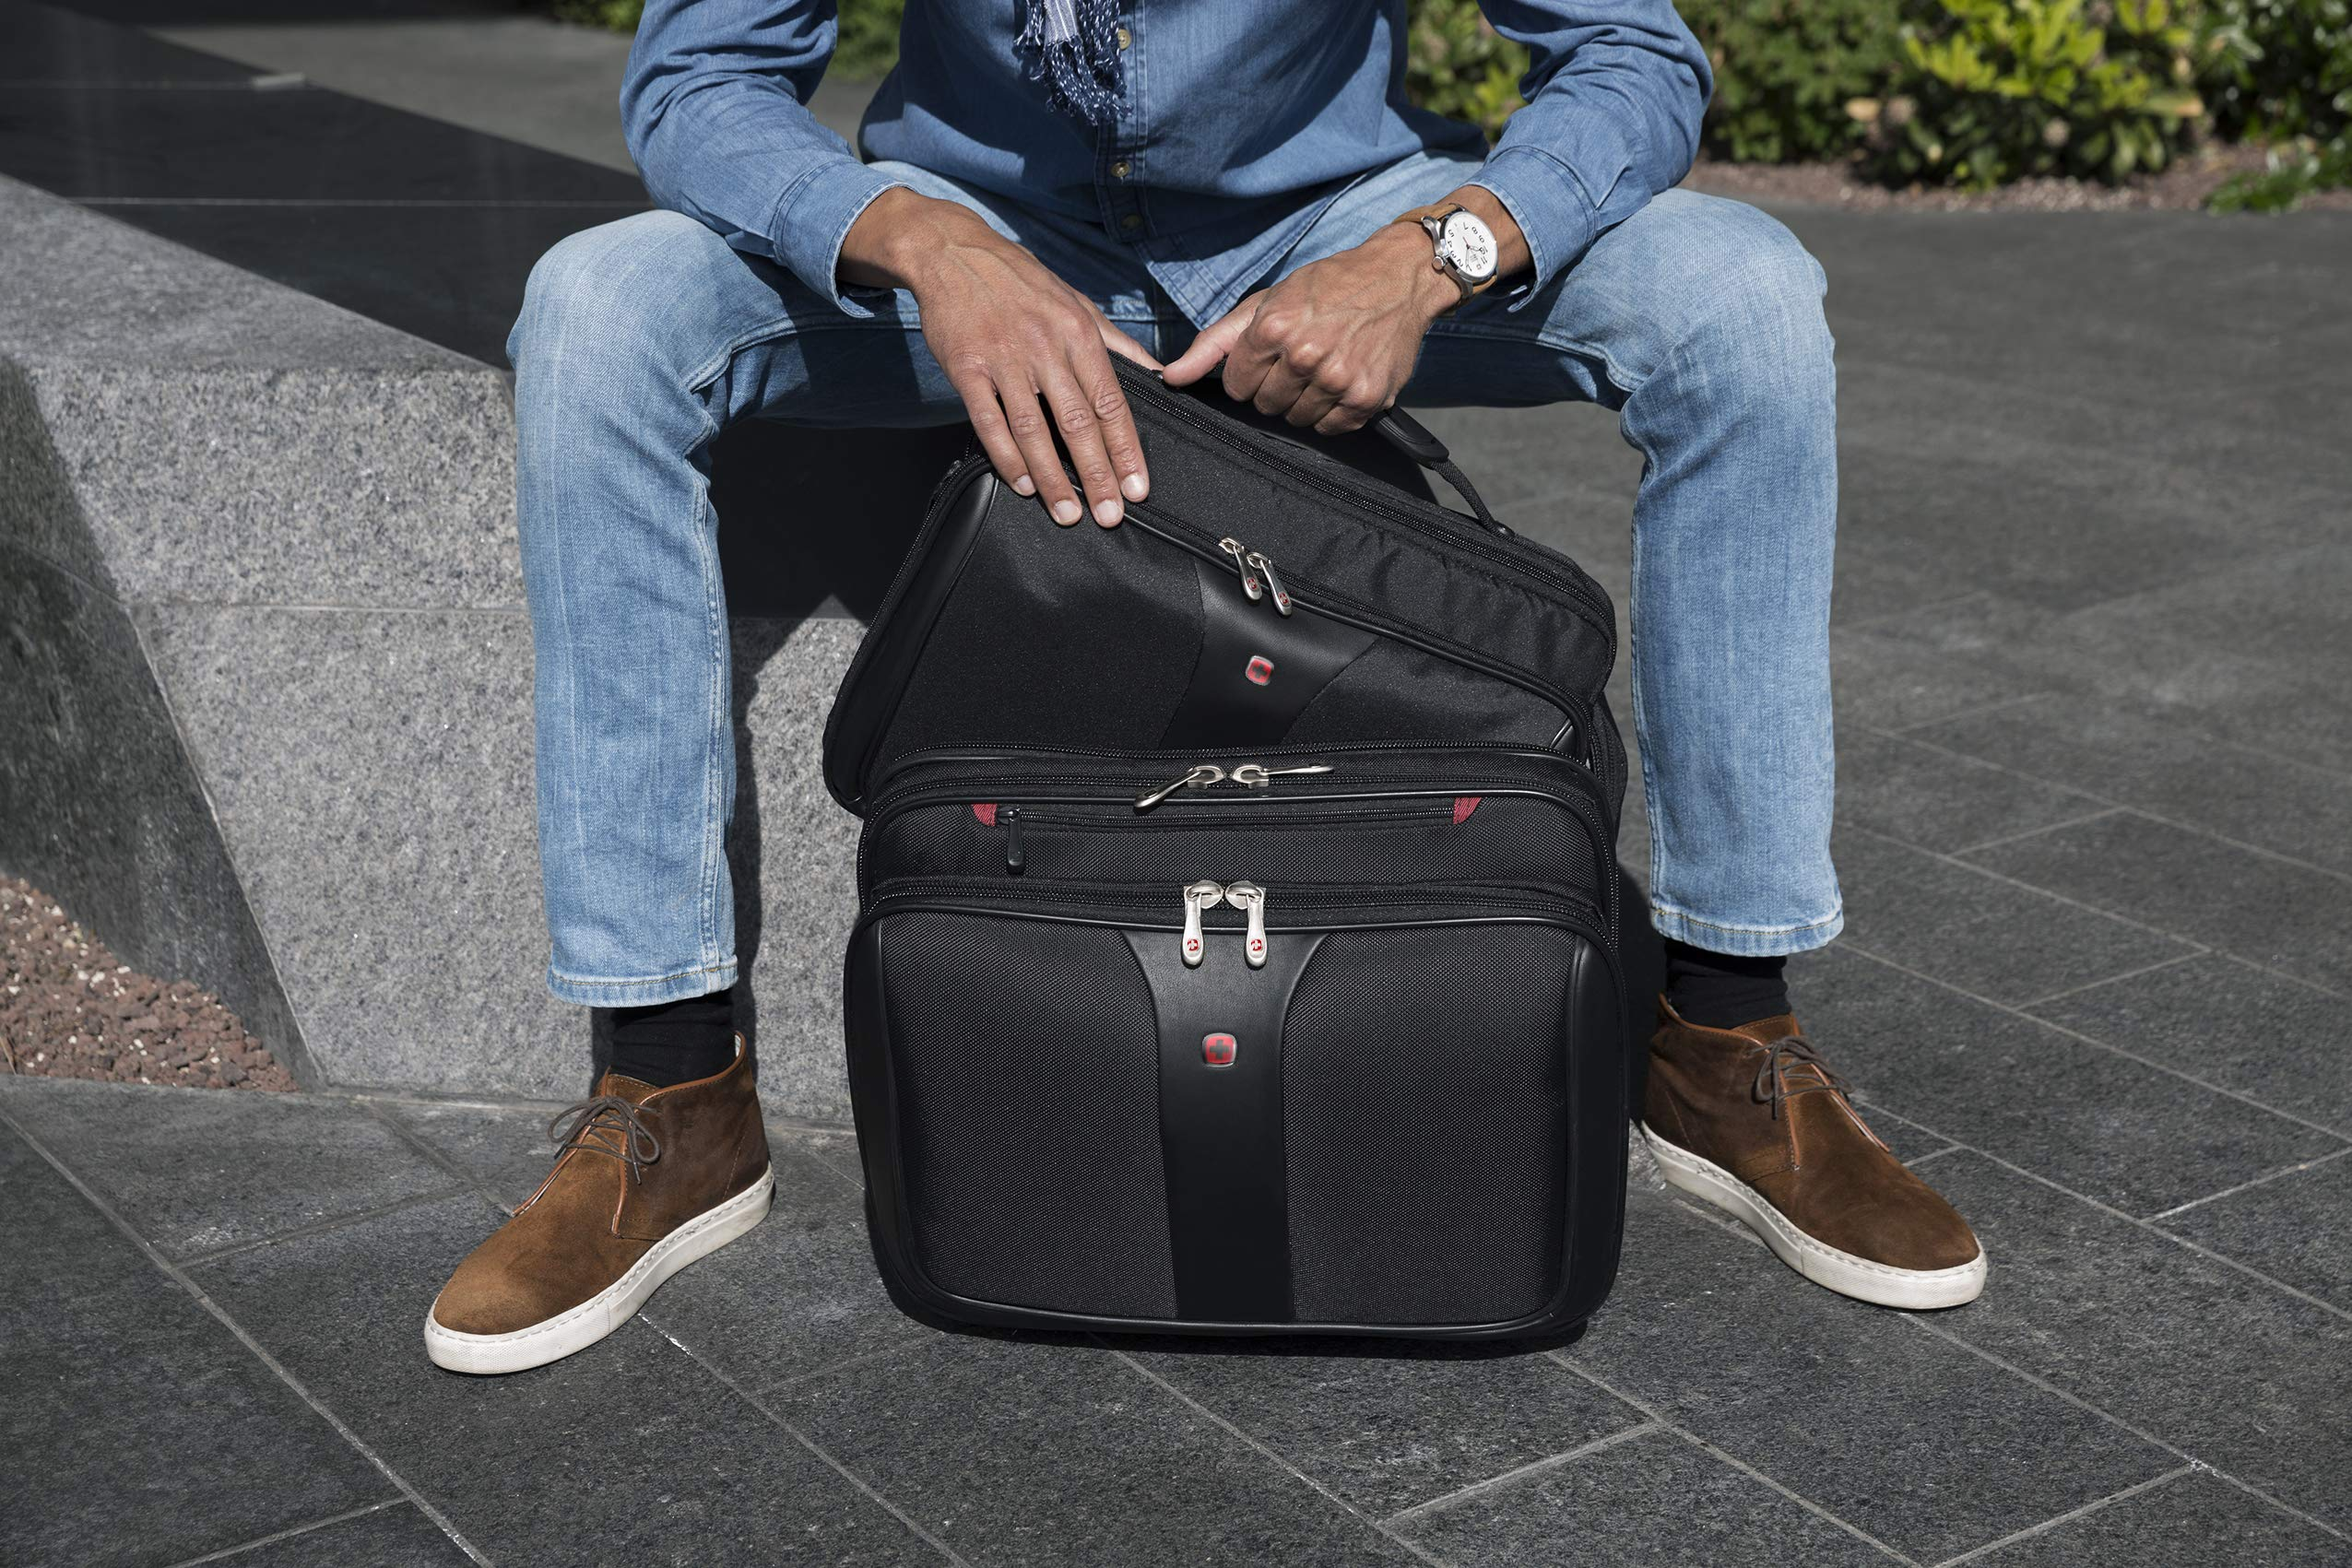 Wenger Maleta Patriot, 43 cm, 25 L, Negro